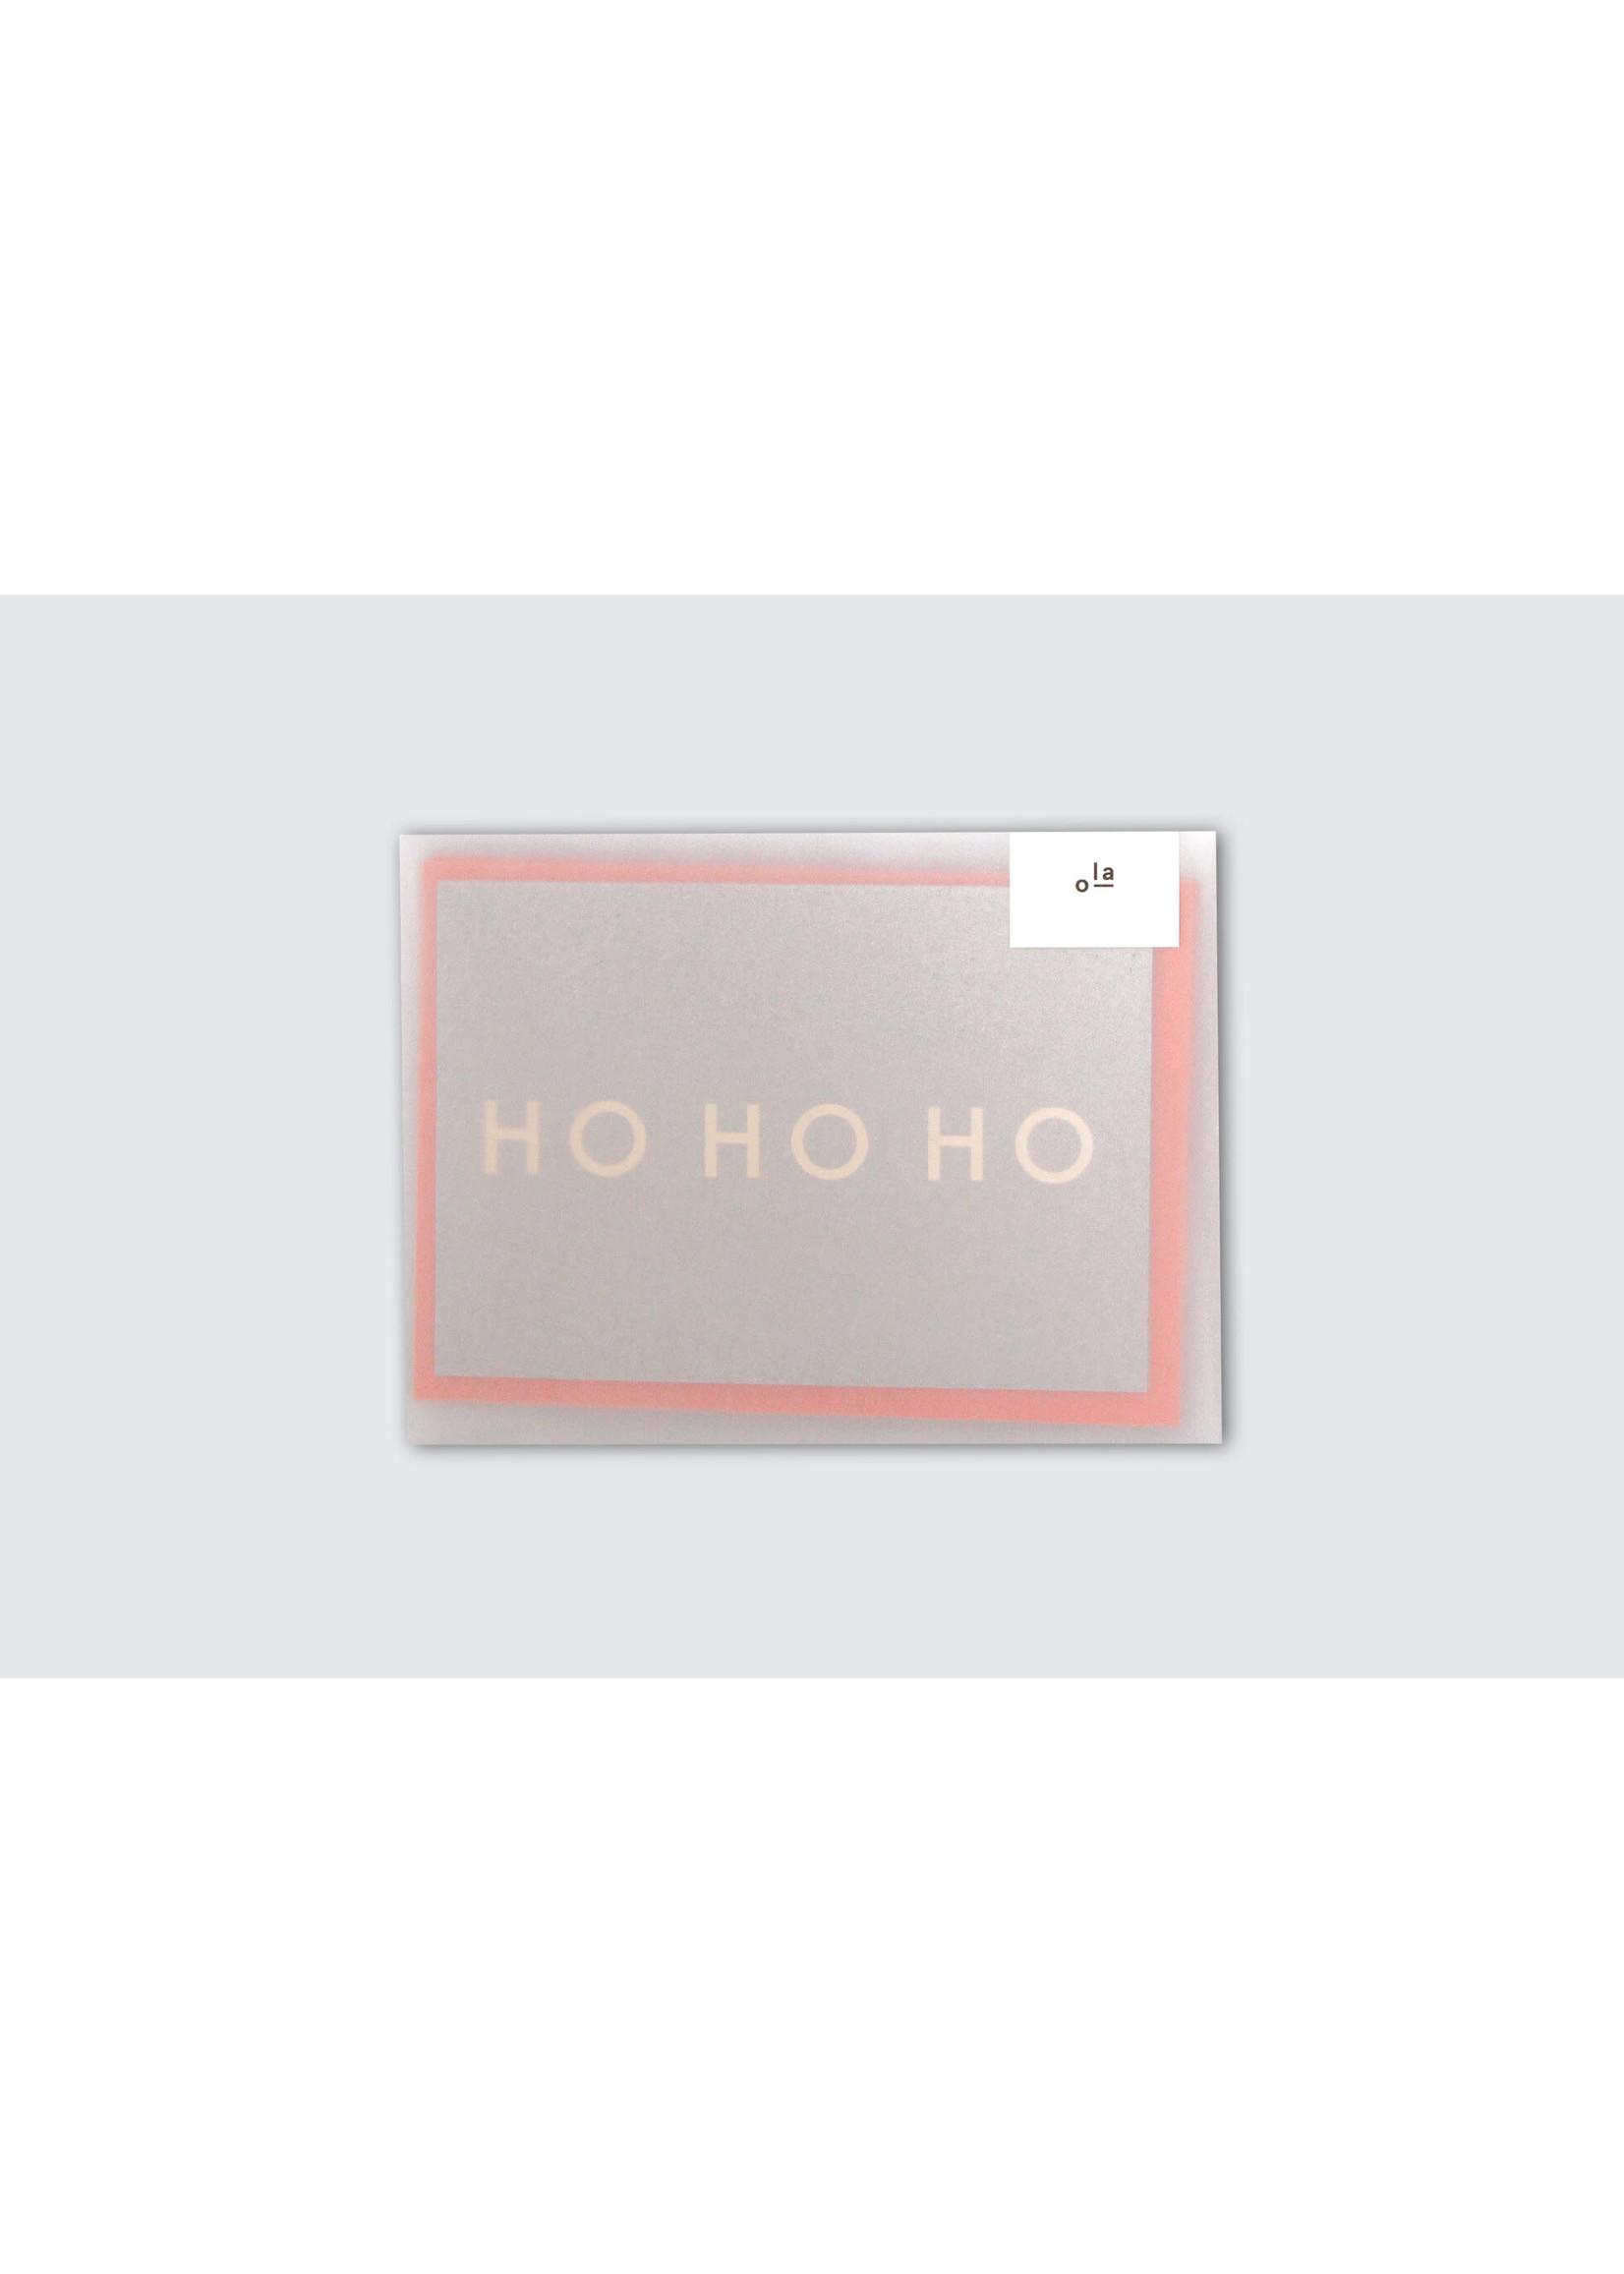 Ola Ola Pack of 6 Festive cards - HoHoHo print Brass on Recycled Grey